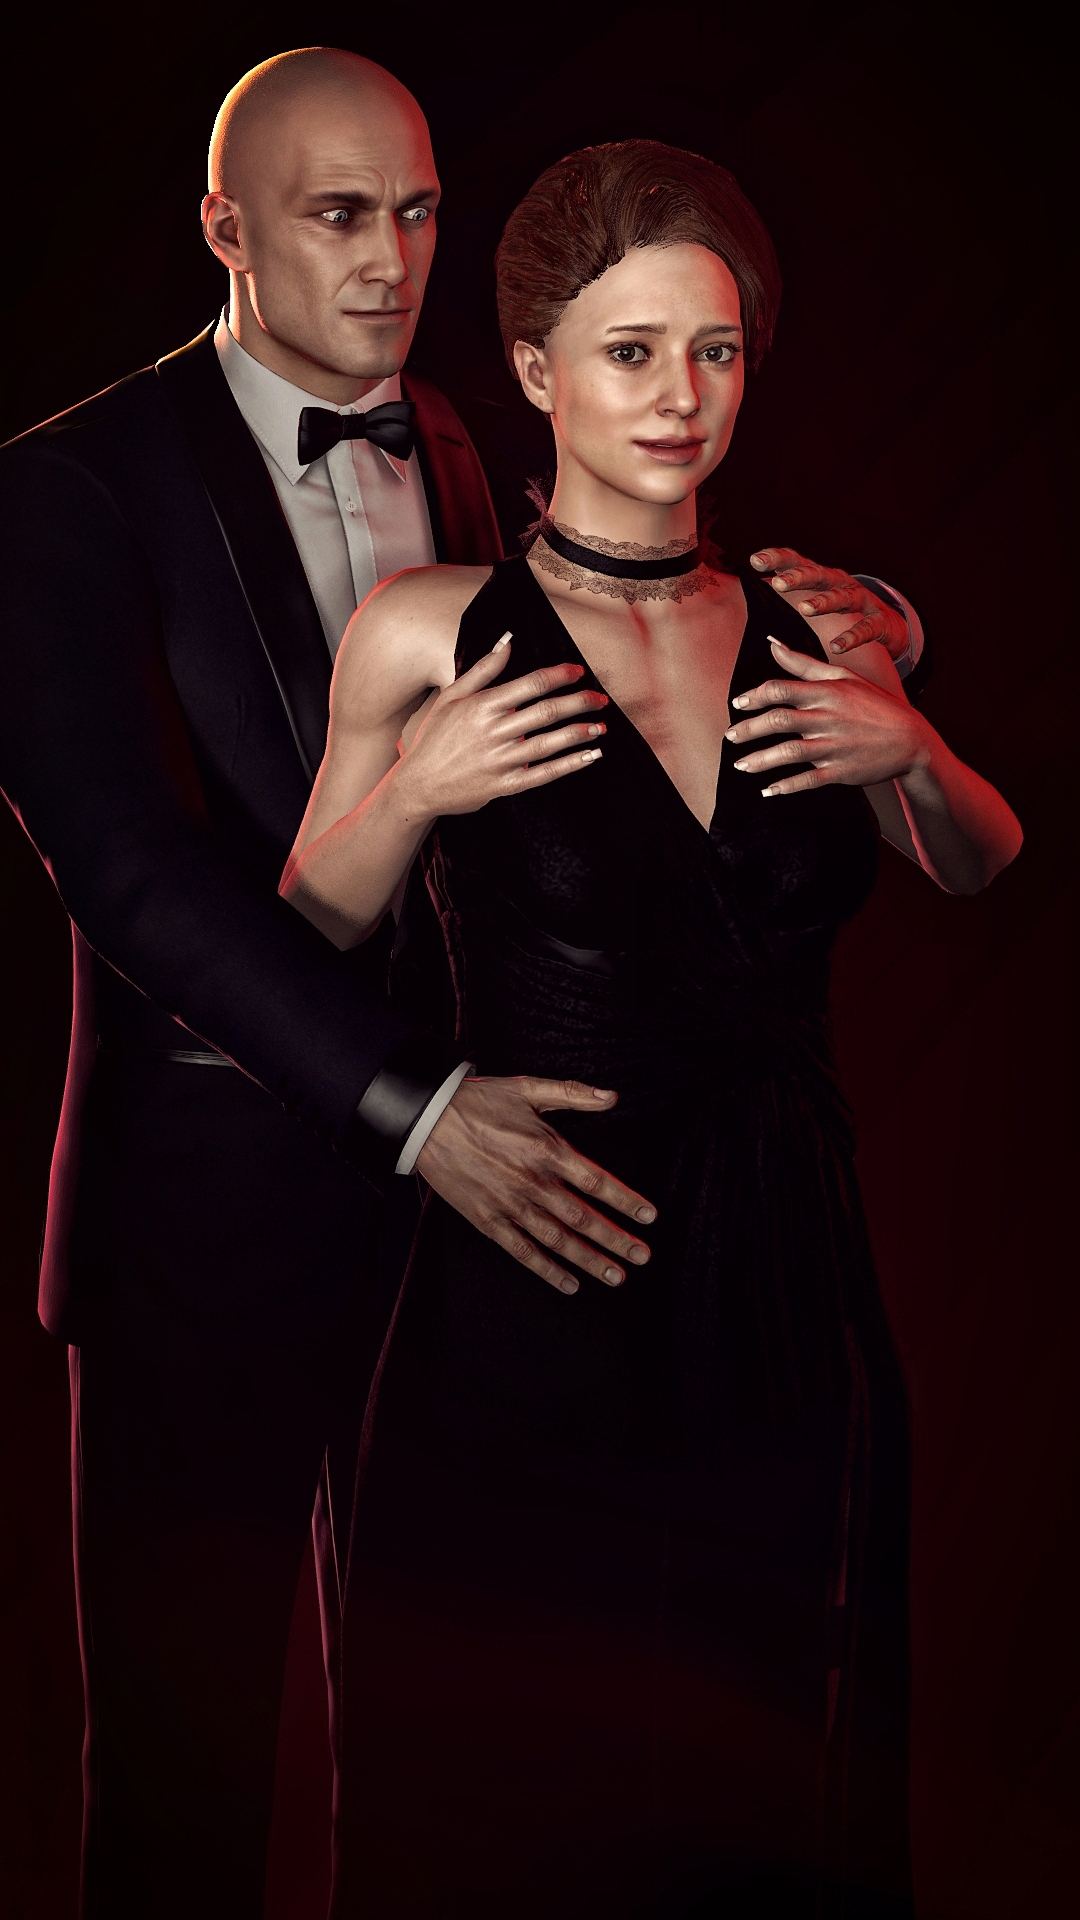 Hitman Agent 47 And Diana Burnwood By Haestromsfm On